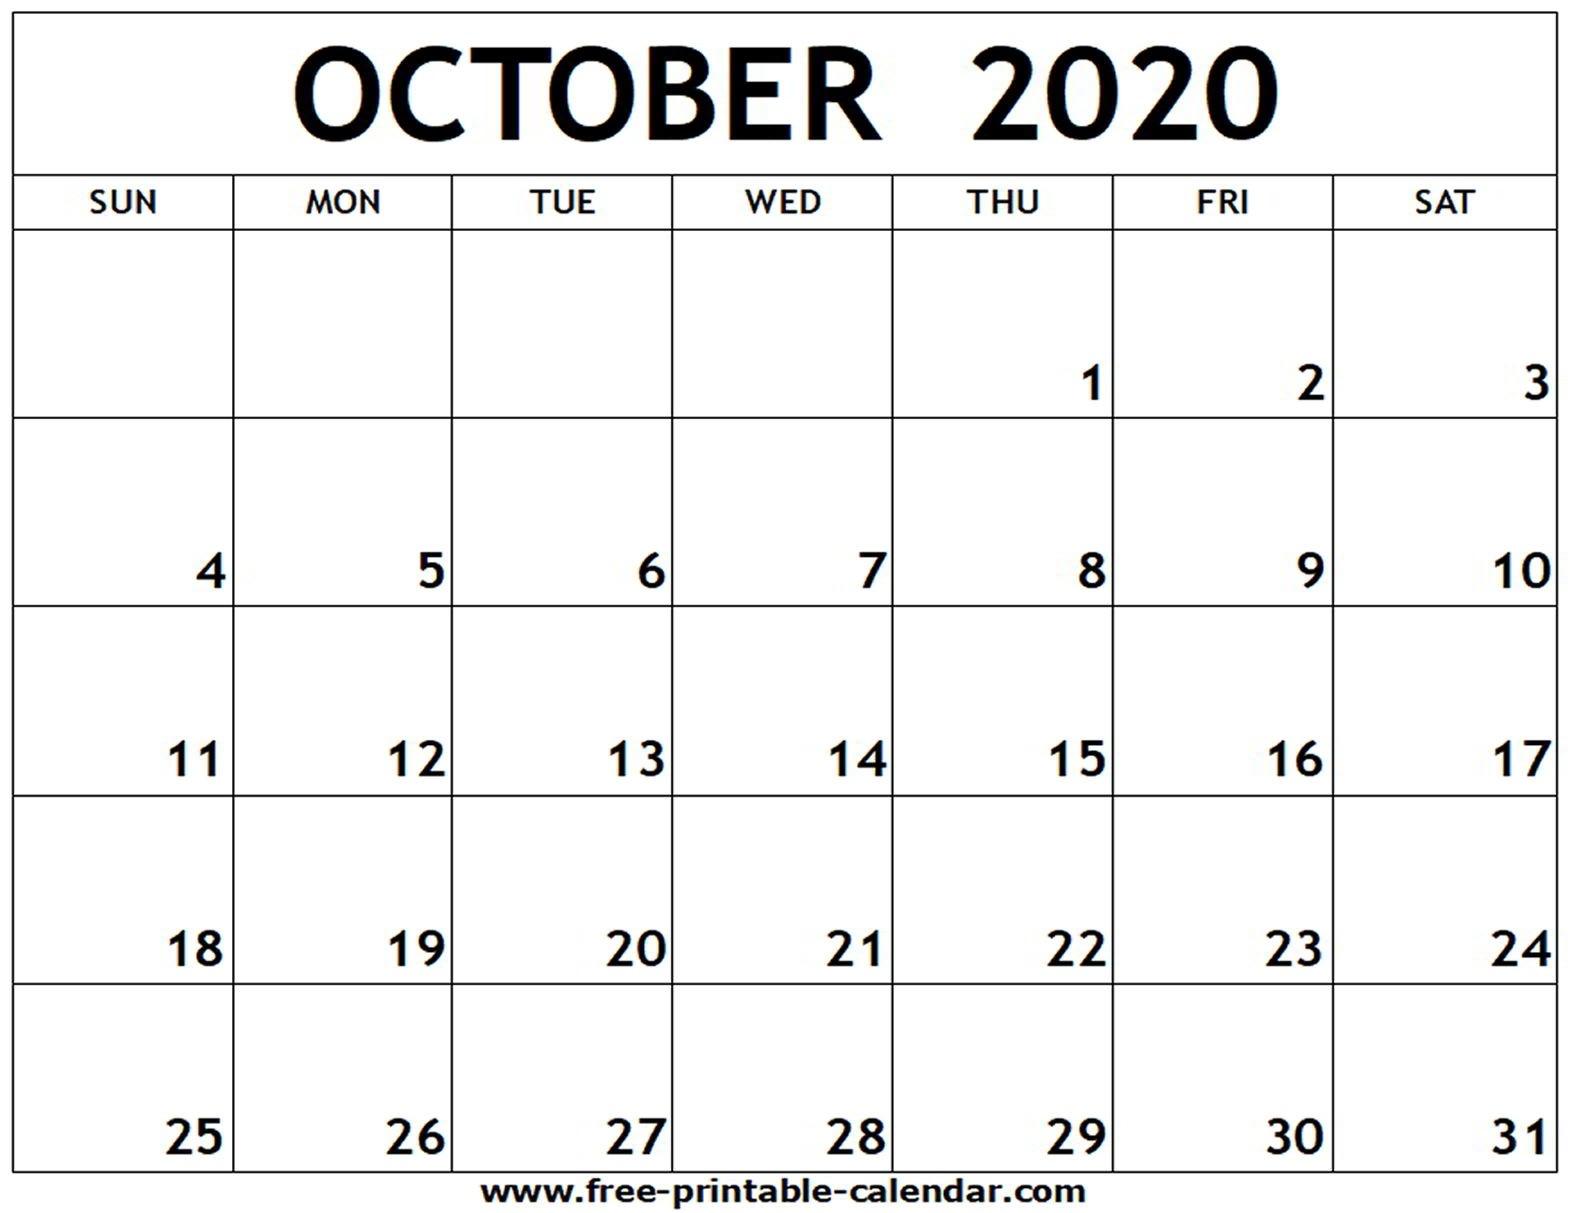 2020 Calendar October-Free Printable Blank October 2020 Calendar Jewish Holidays